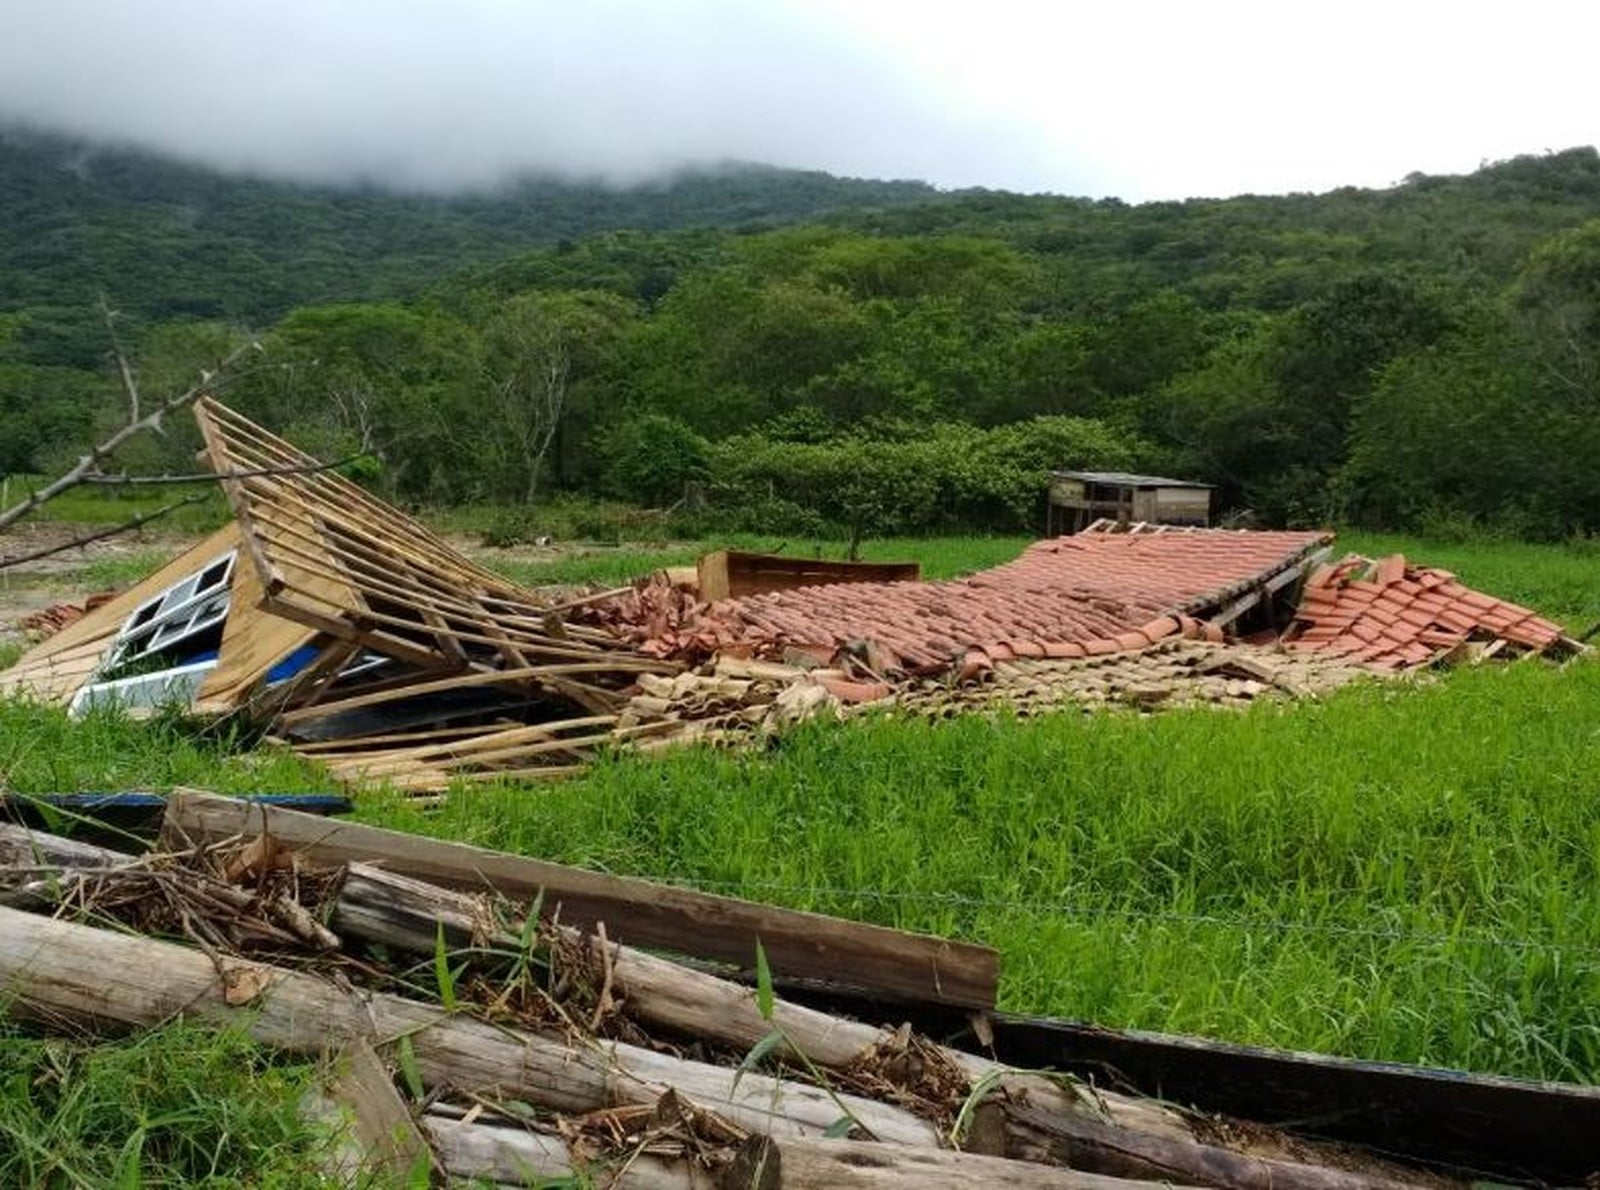 Defesa Civil estadual emite alerta de chuva intensa para a região